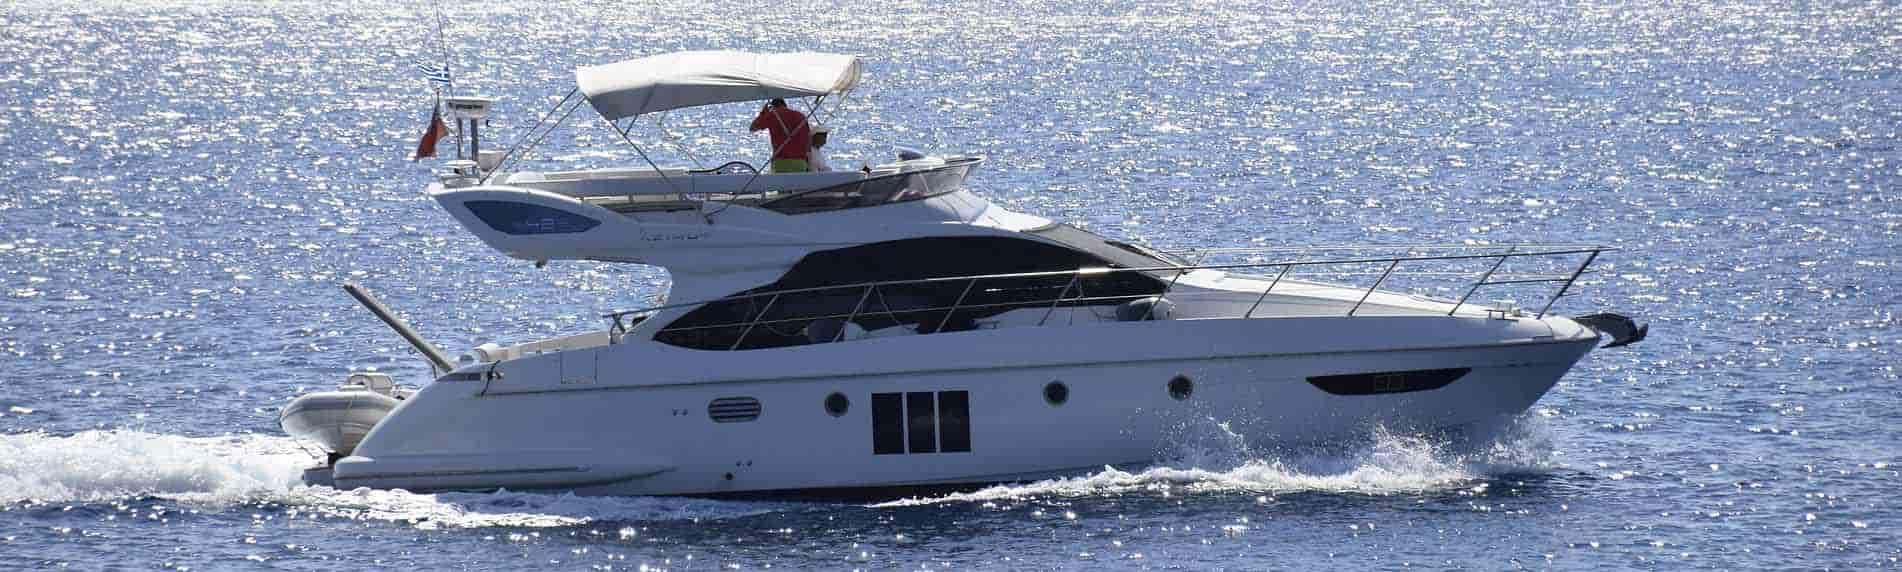 dubai deep sea cruising thrill